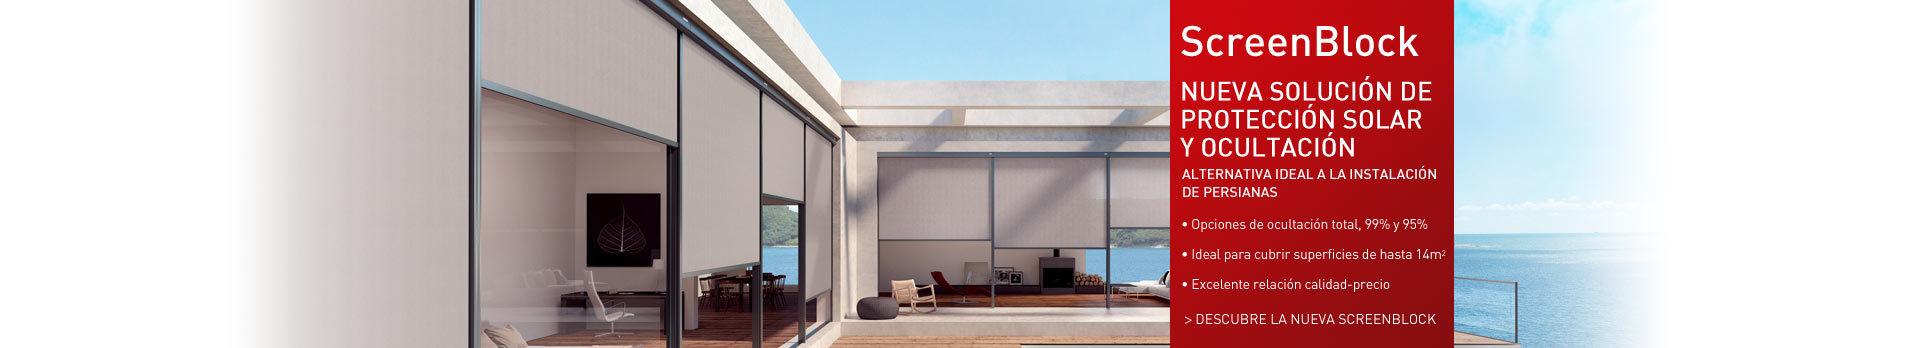 ventanas-luminosas-persiana-screenblock-slider-6